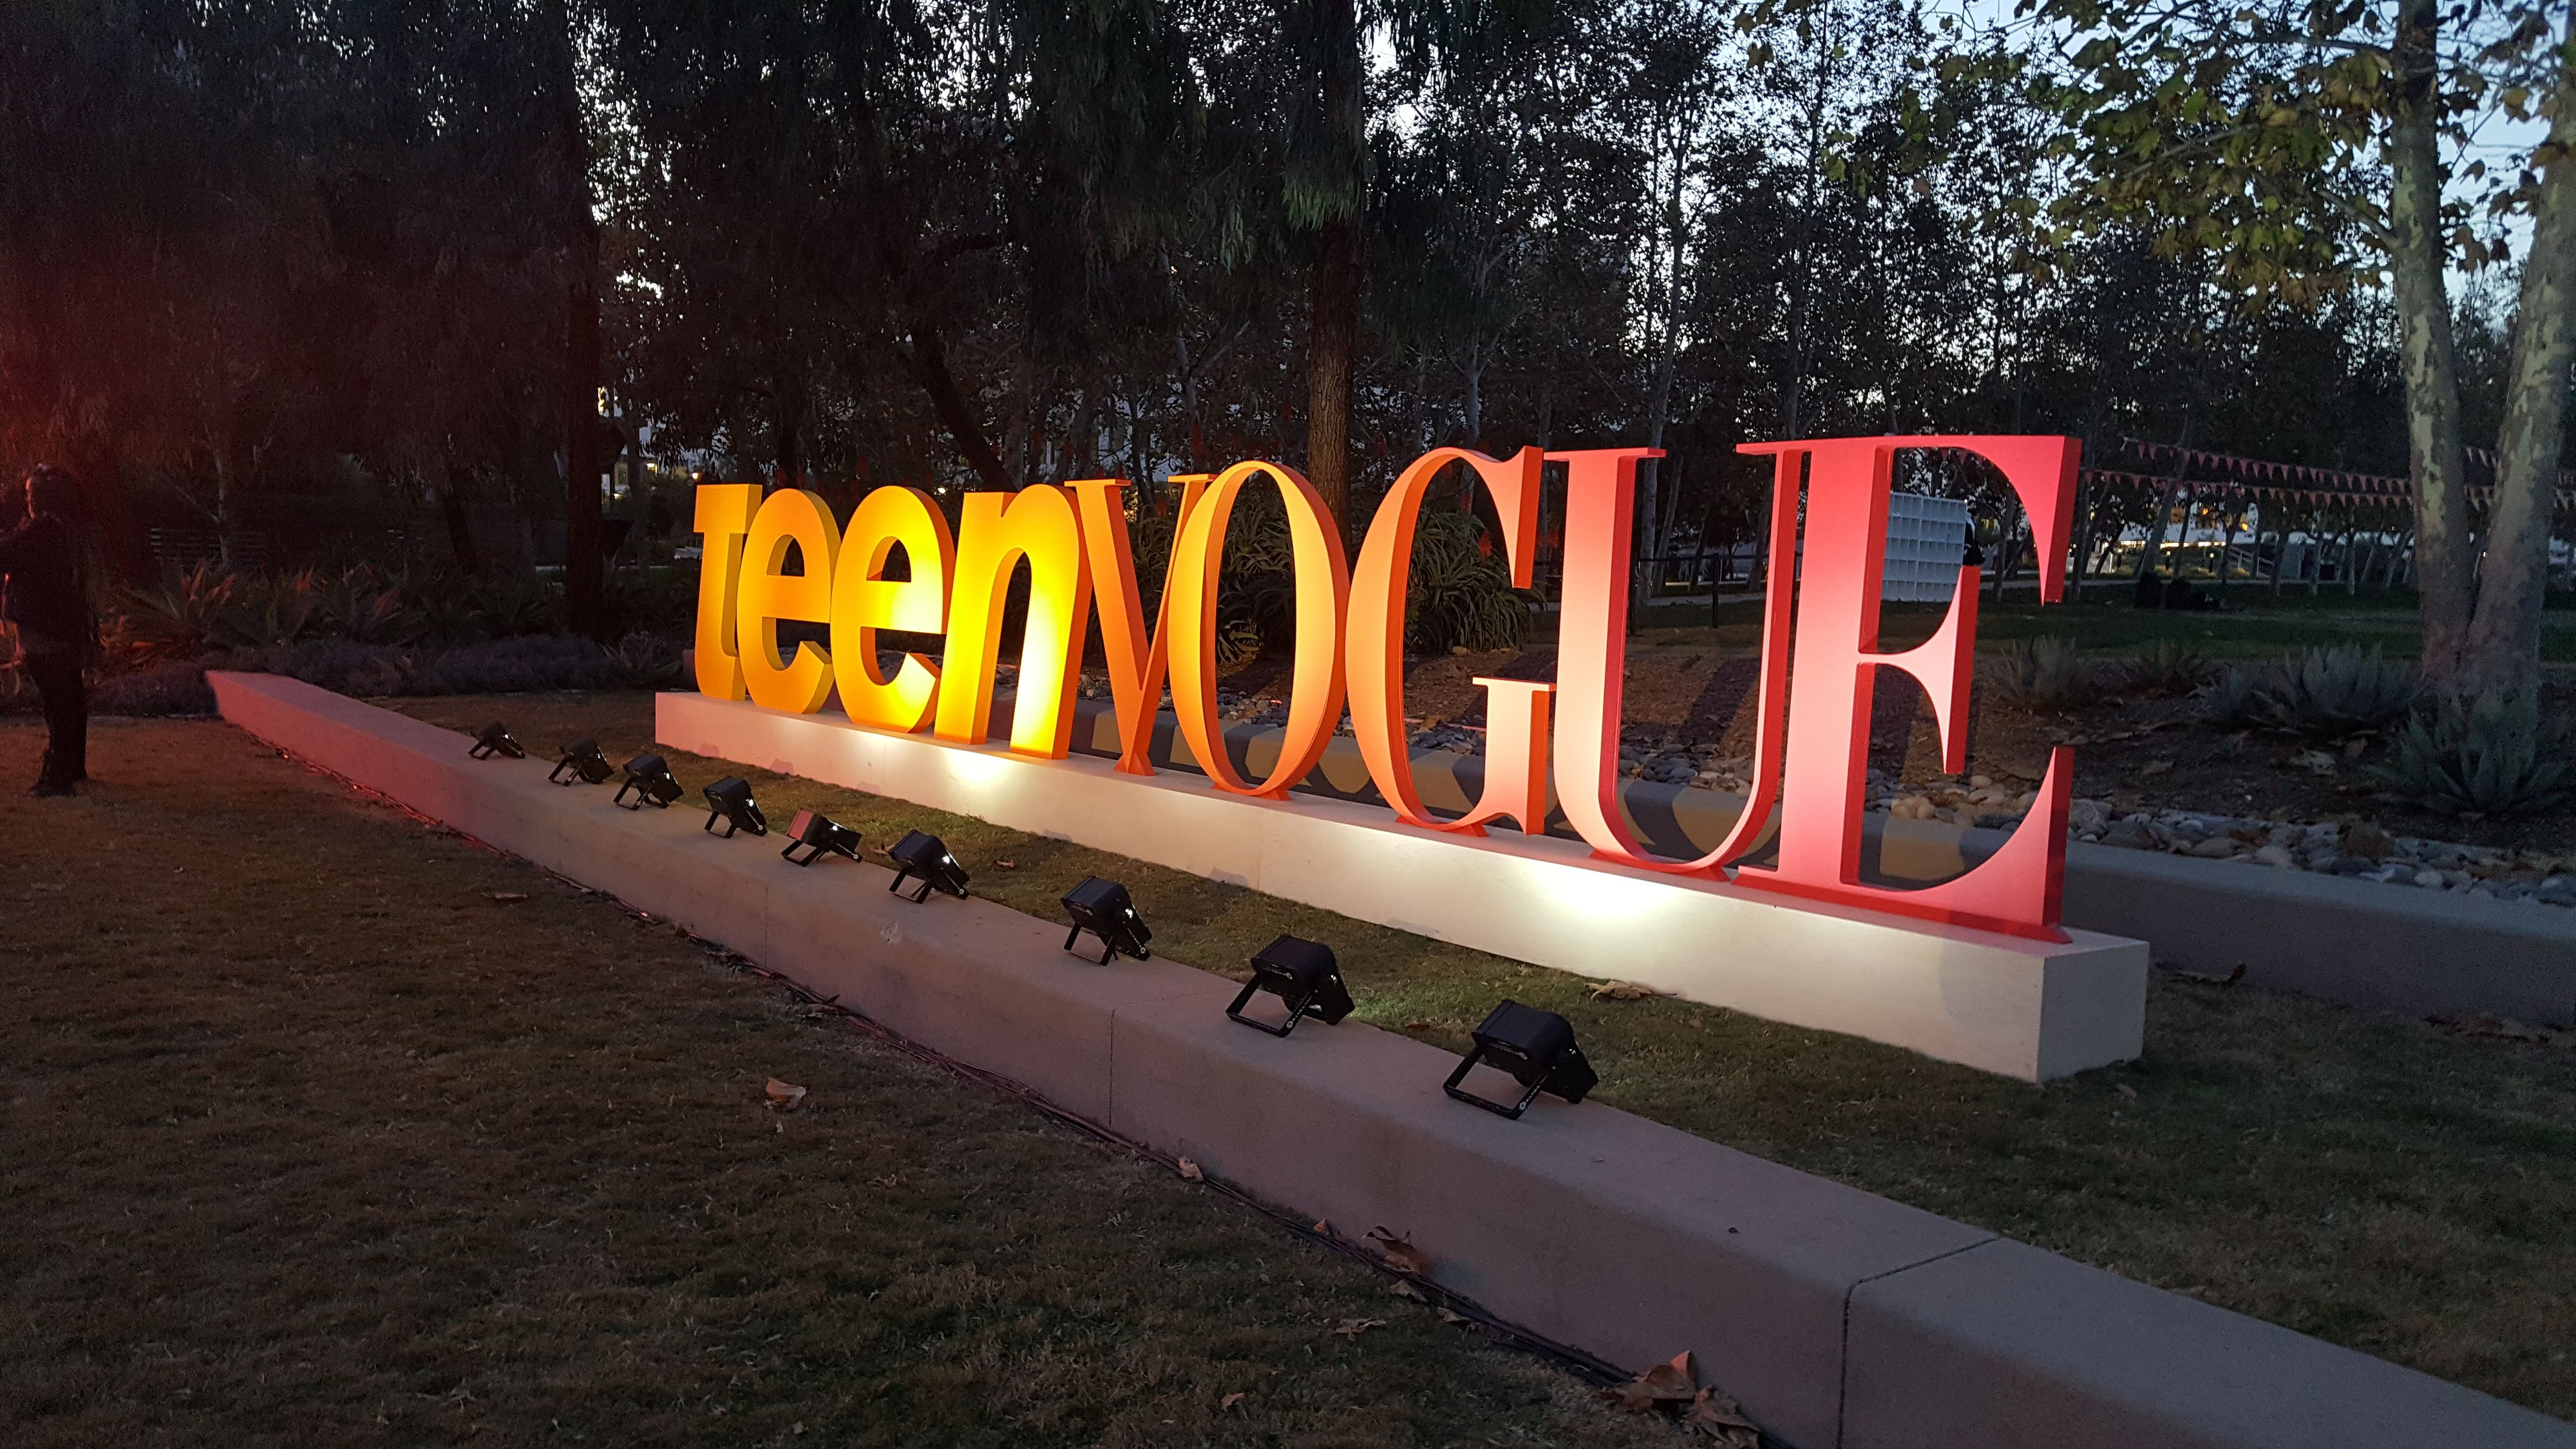 teen vogue signage